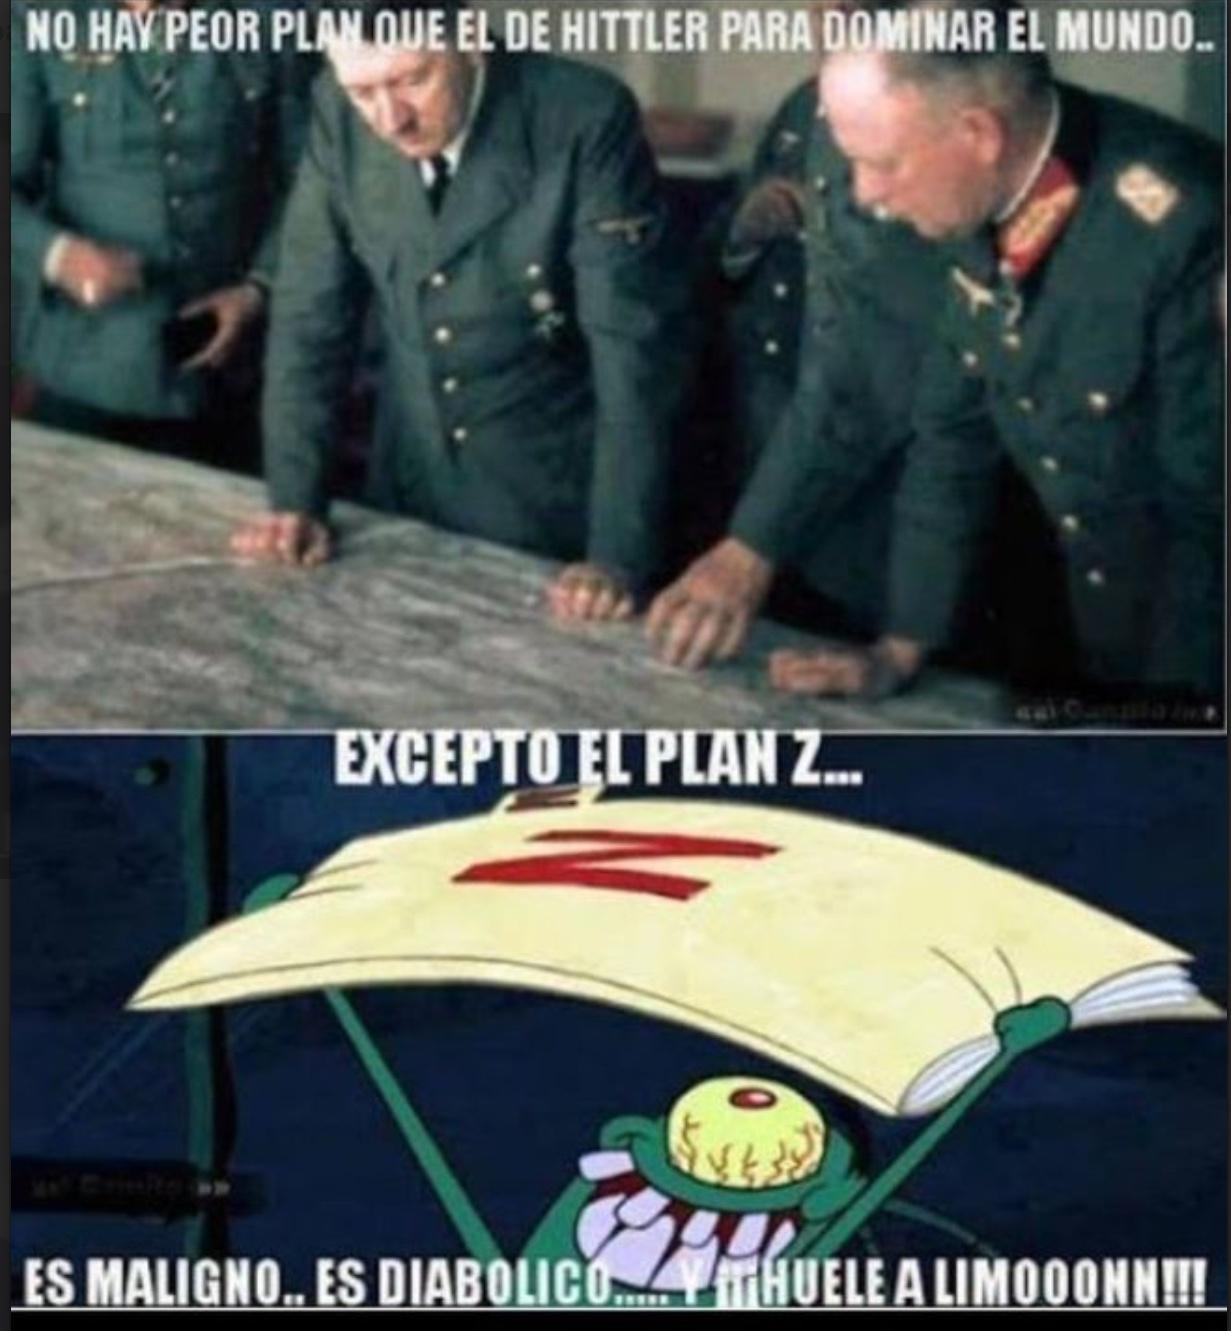 el gran plan z jajaja - meme